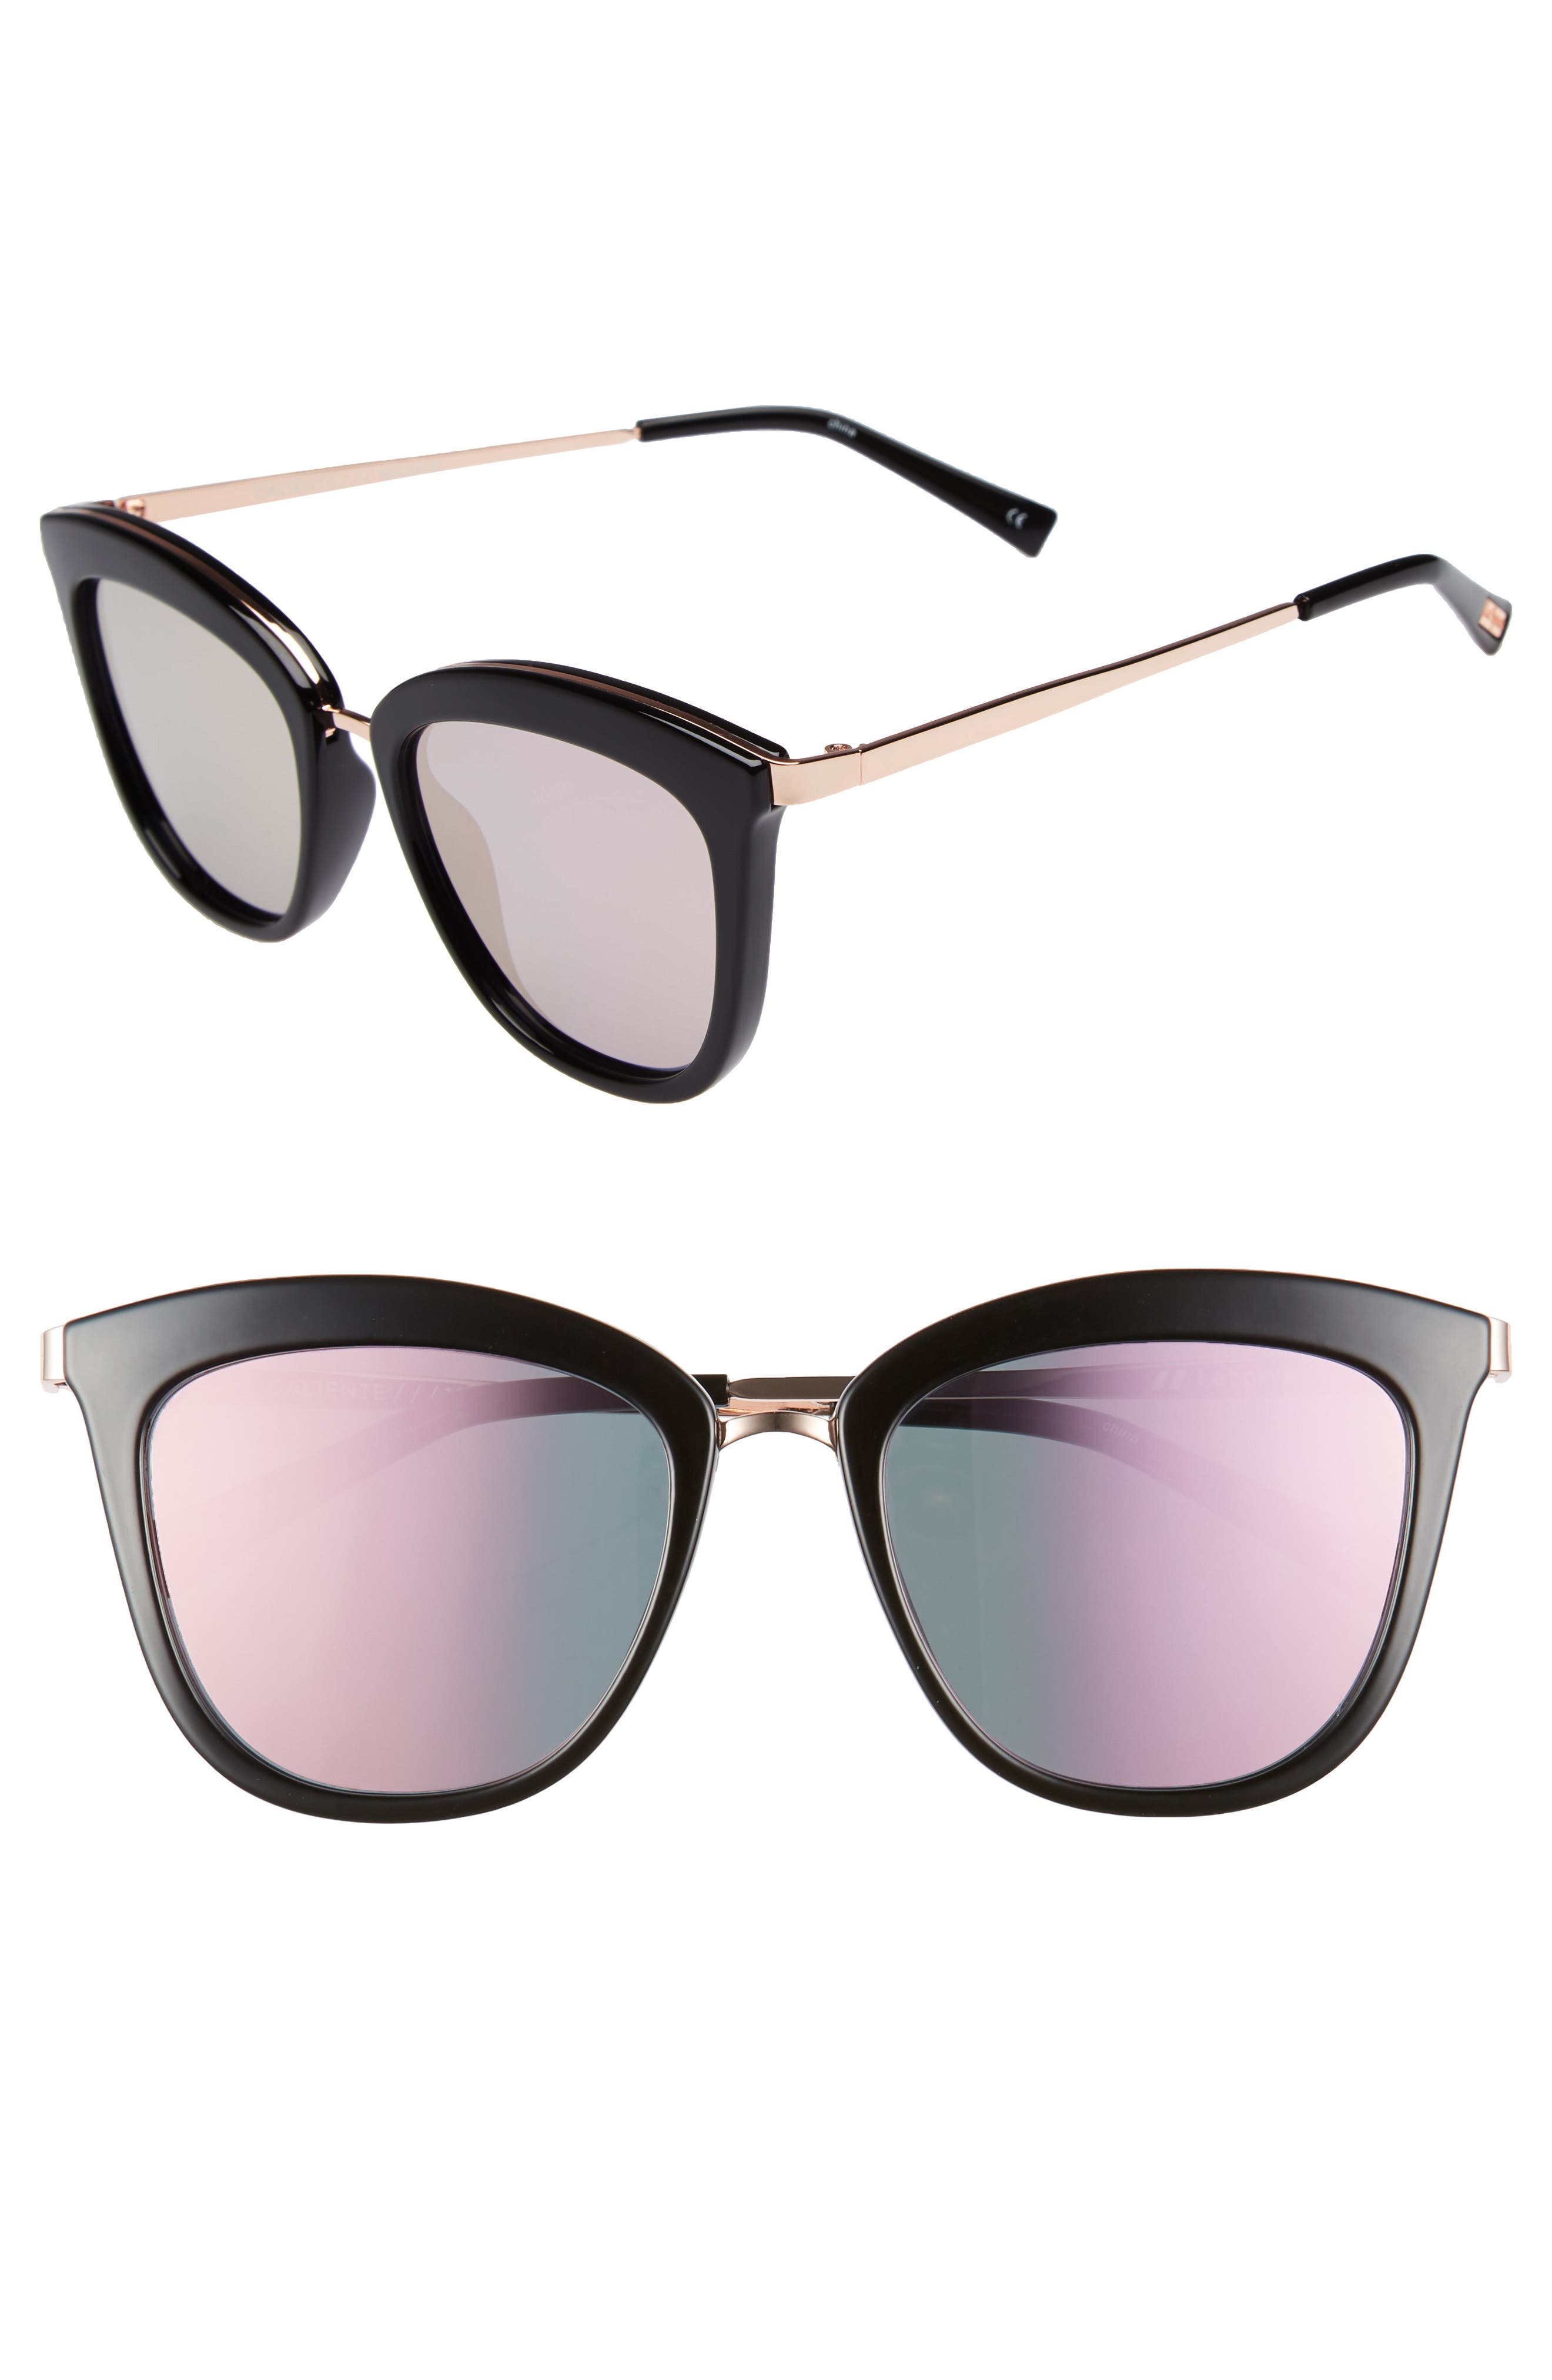 Caliente 53mm Cat Eye Sunglasses,                         Main,                         color, Black/ Rose Gold